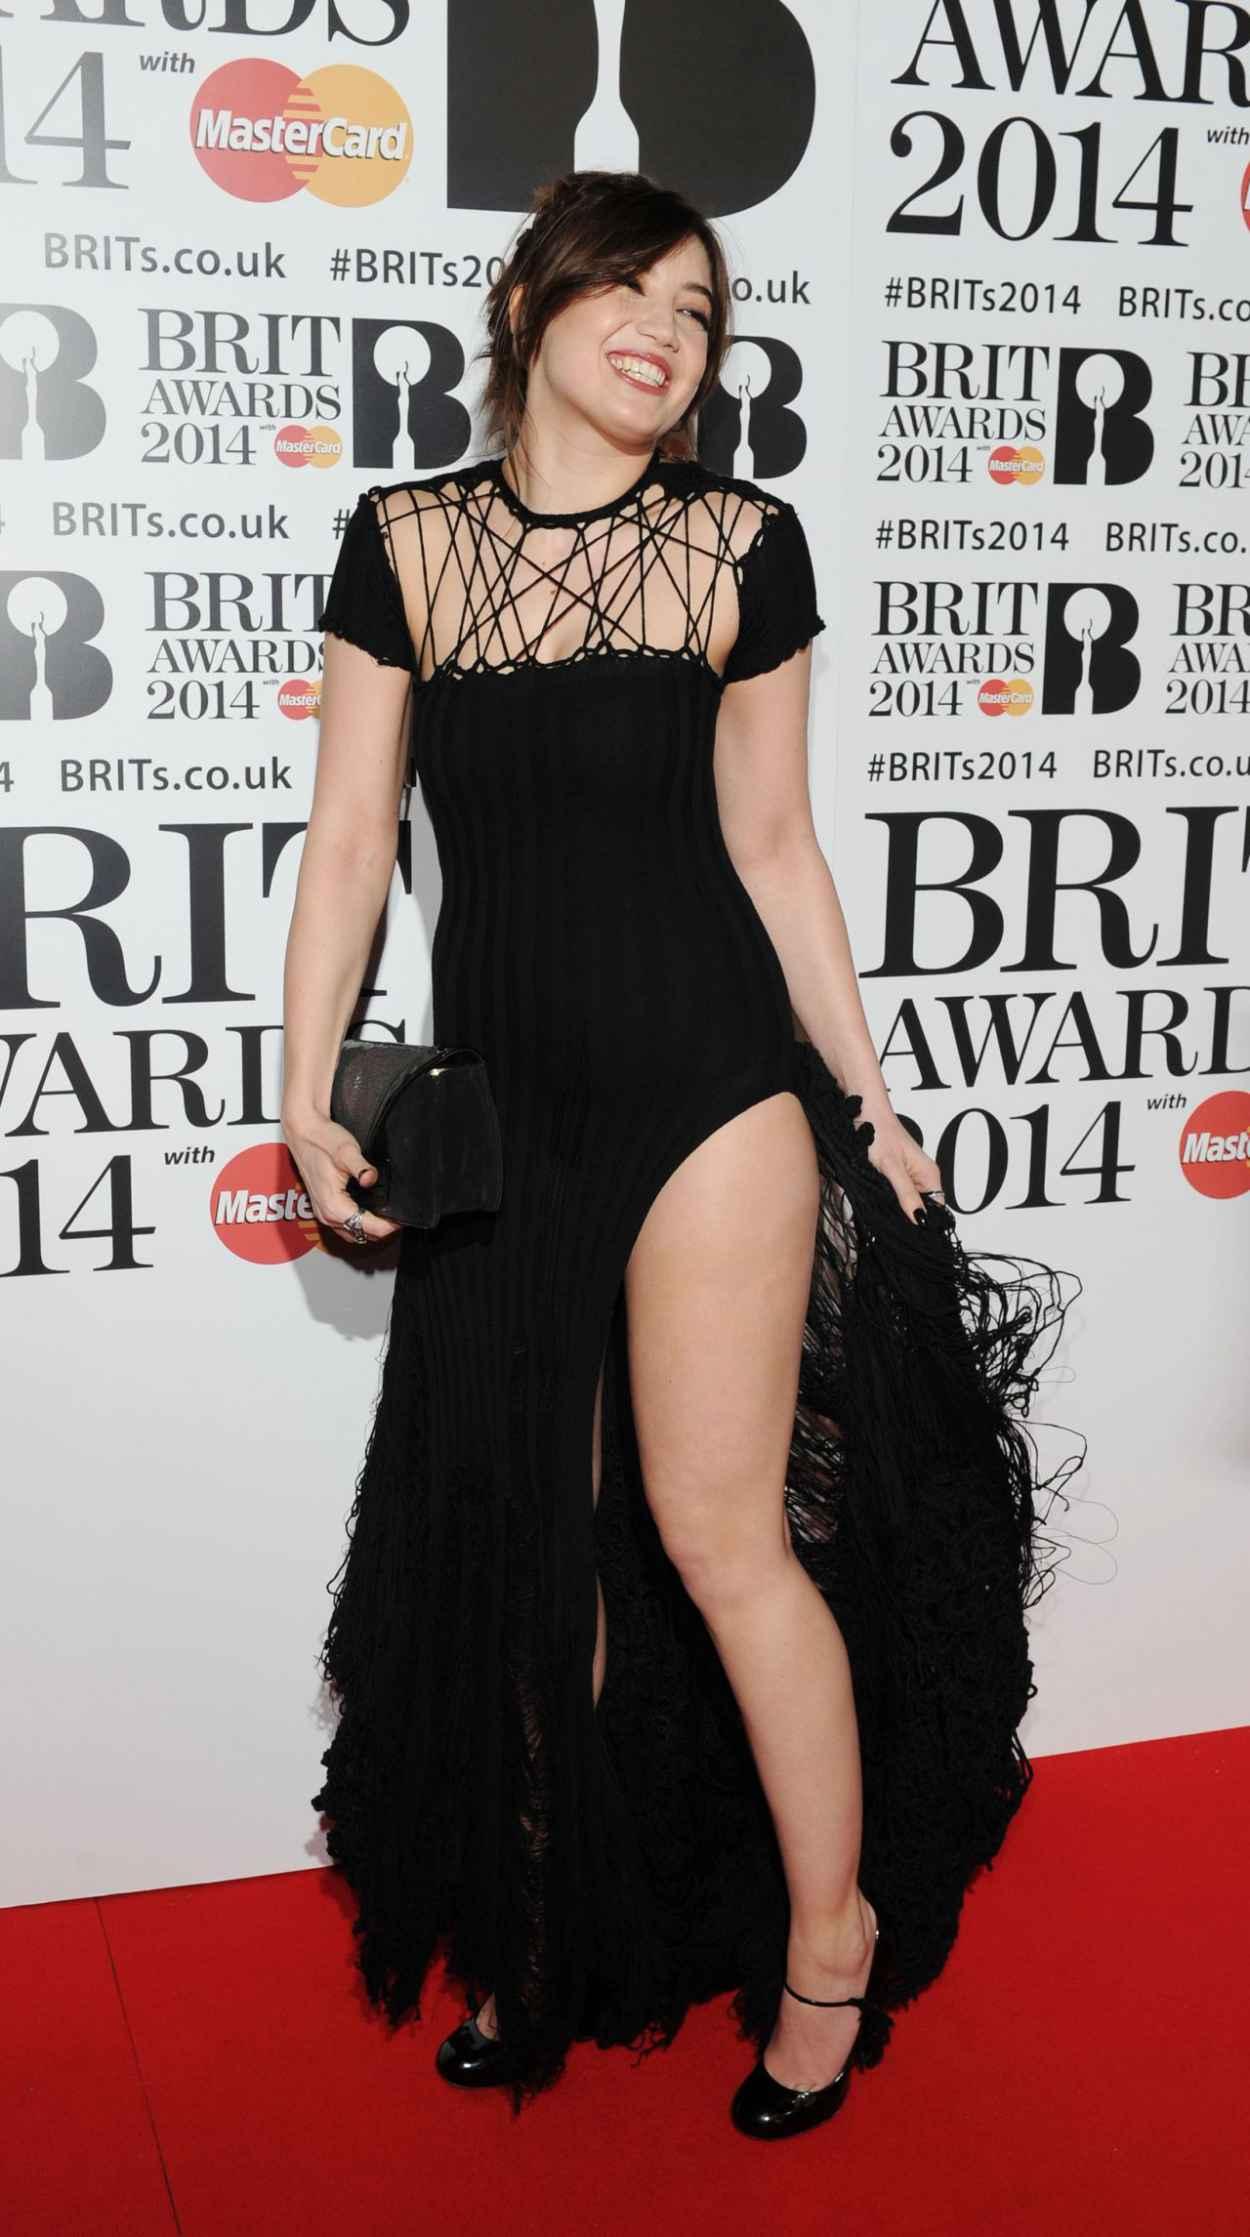 Daisy Lowe Wearing Sibling Dress at 2015 Brit Awards in London-1